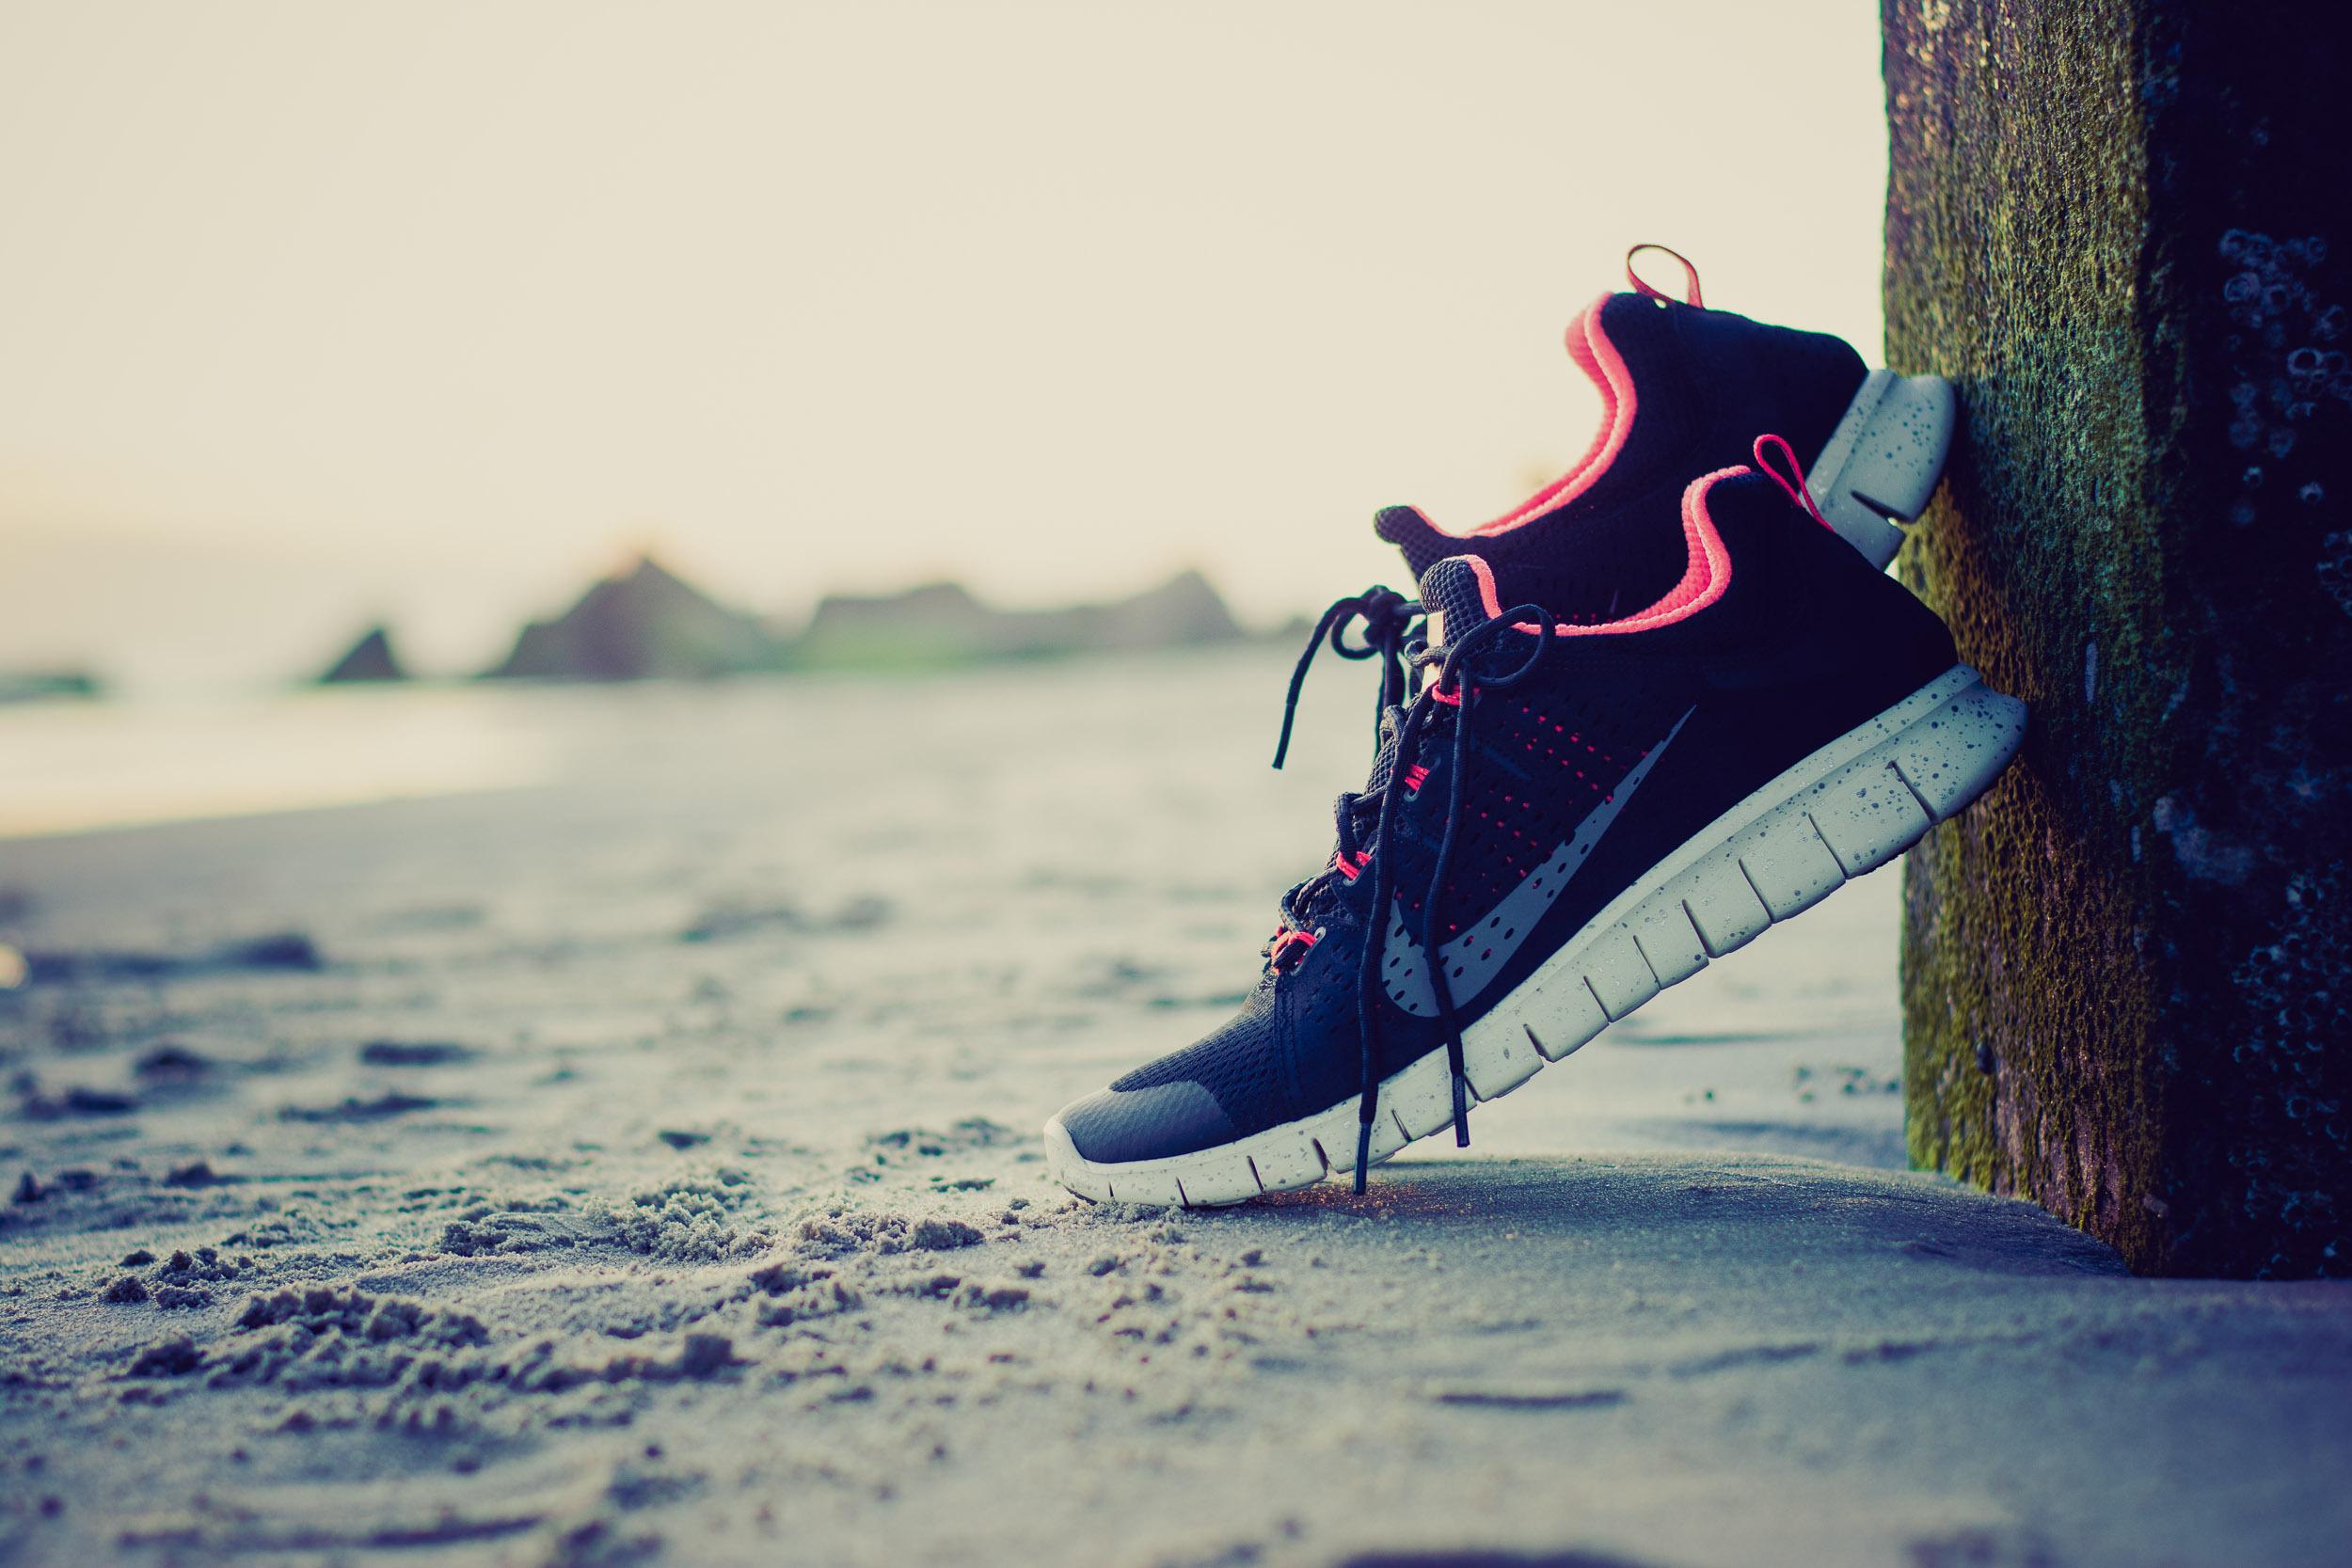 Кросовок Nike  № 2550593 бесплатно